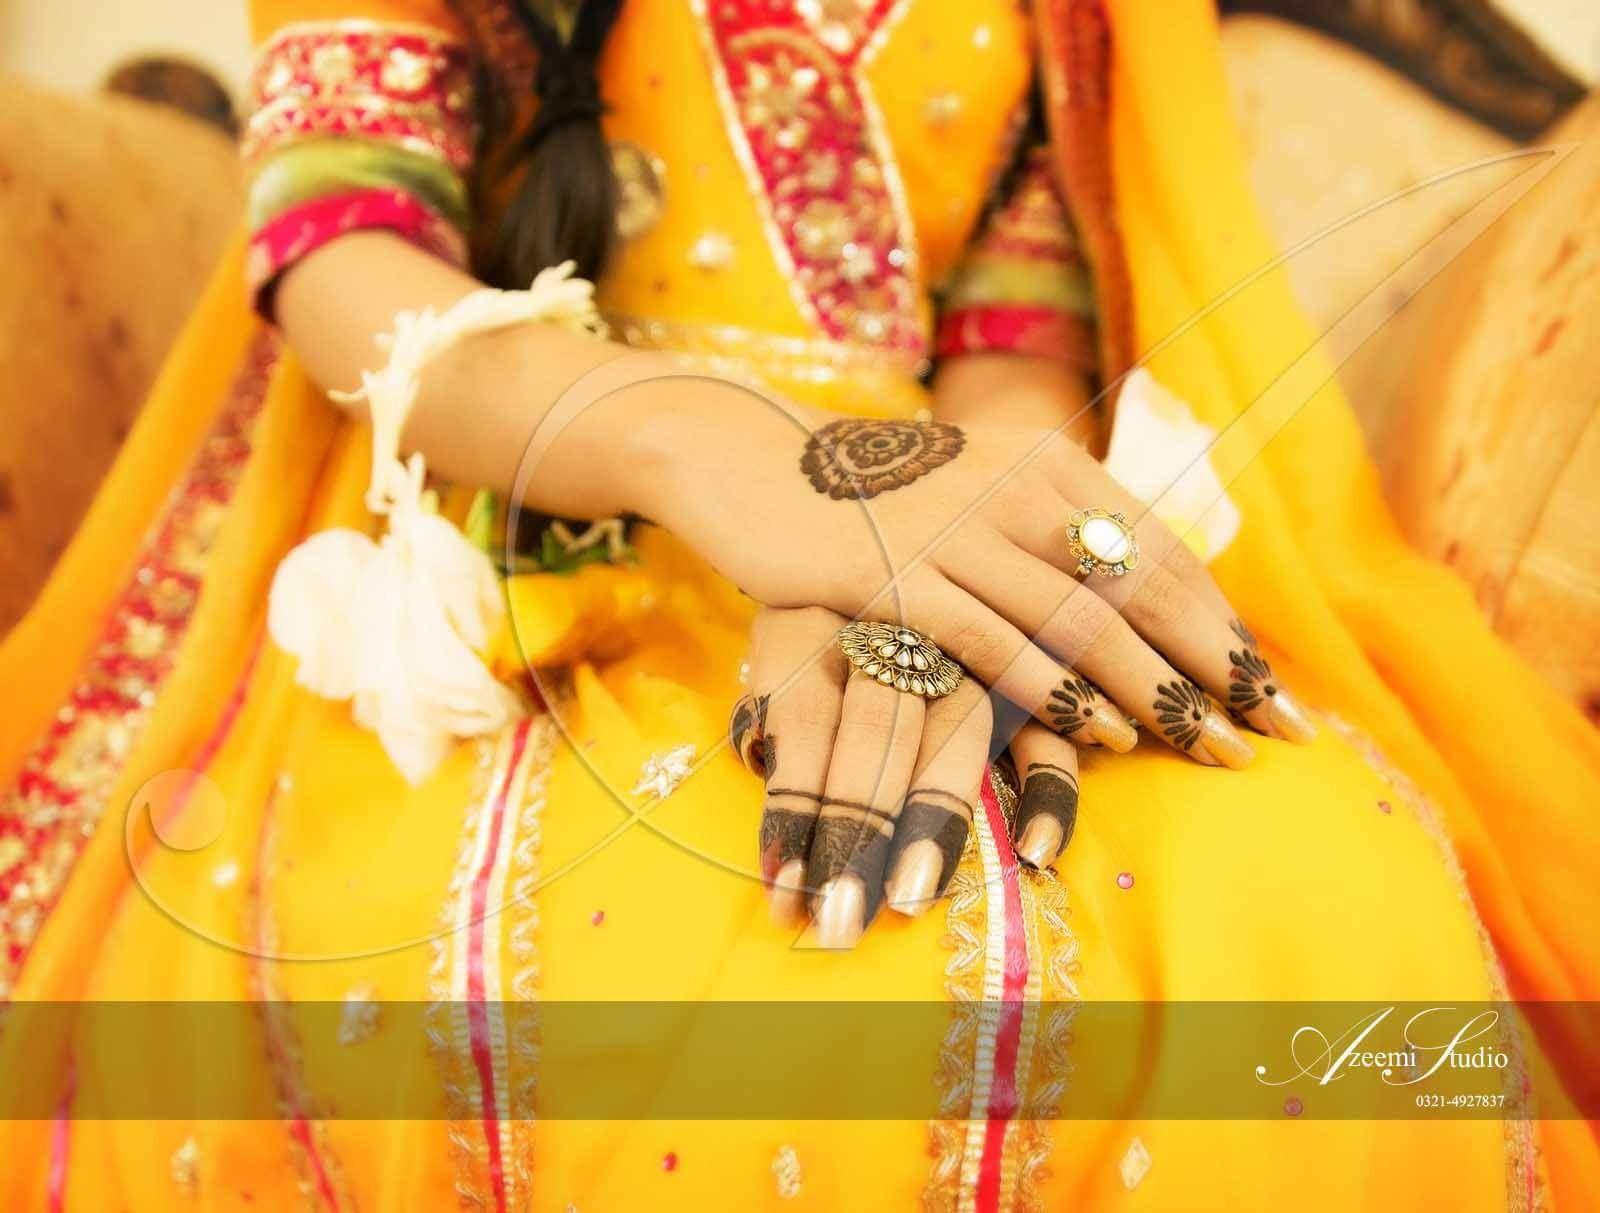 Mehndi For N Brides : Azeemi studio photography mayoo'n bride hands pinterest